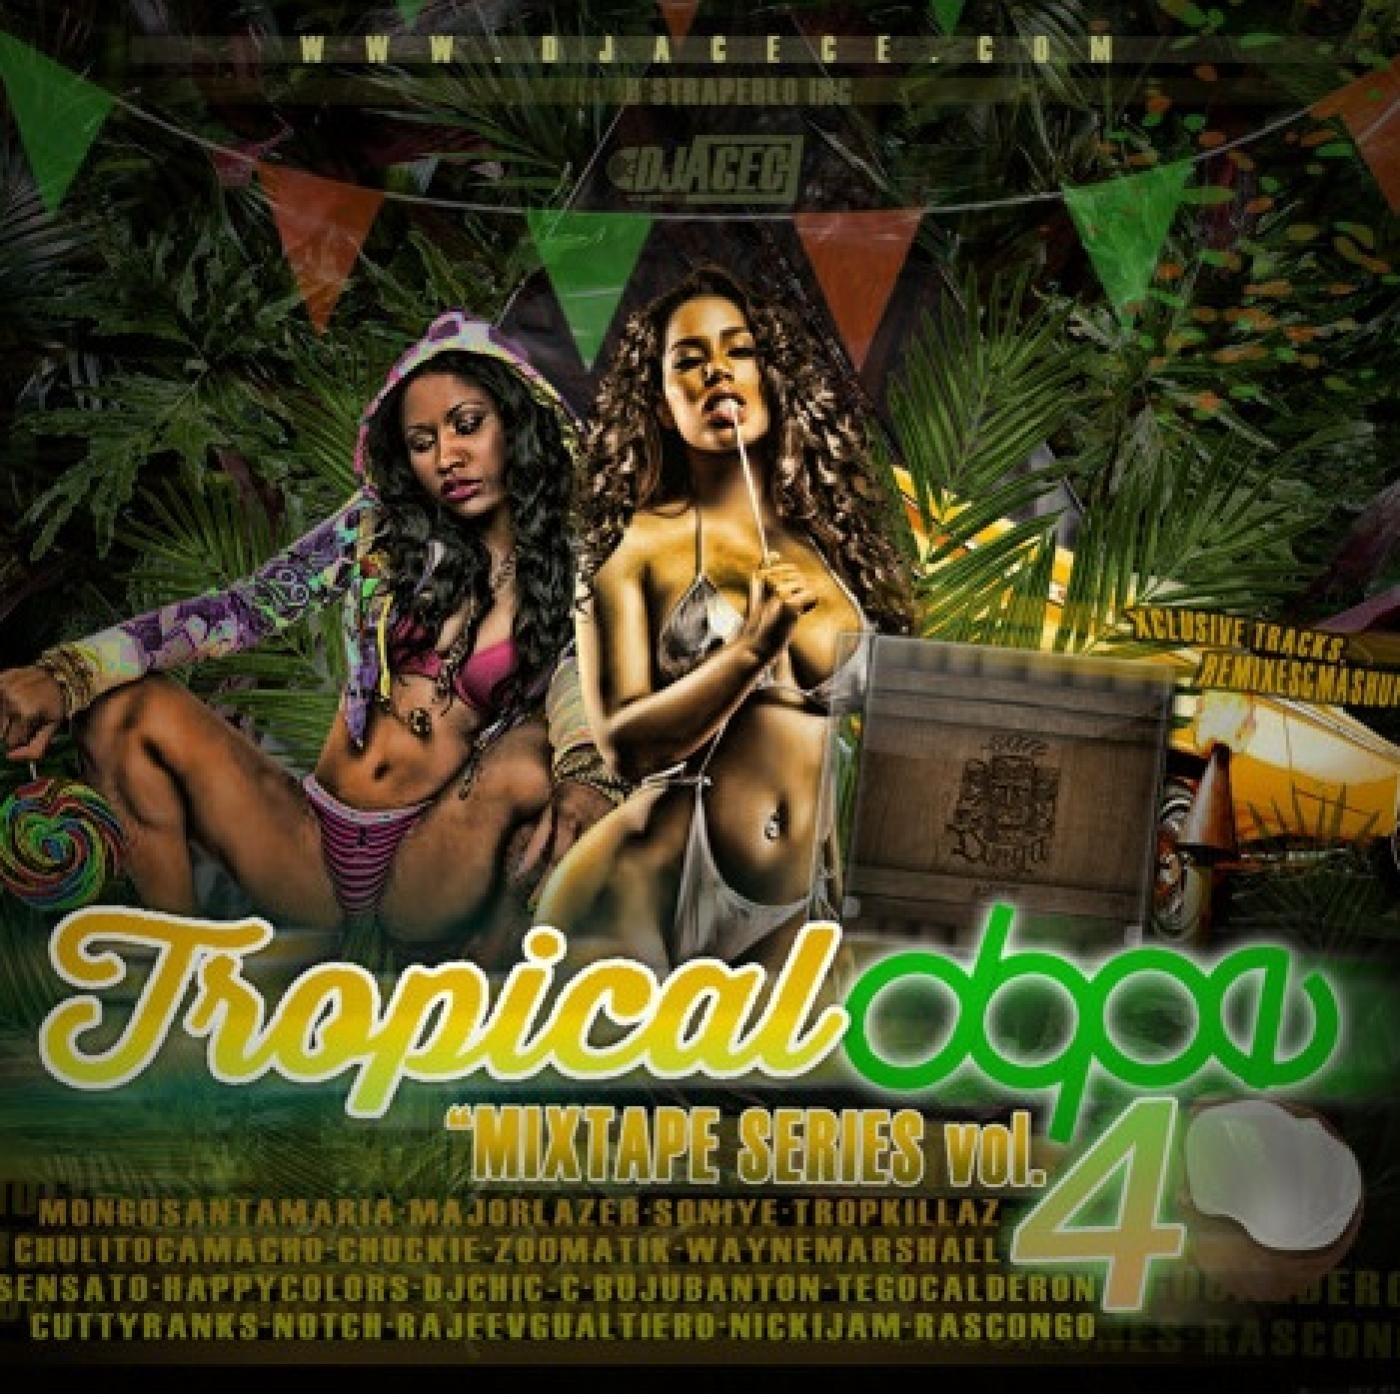 <![CDATA[Tropical Dope Mixtape Series]]>